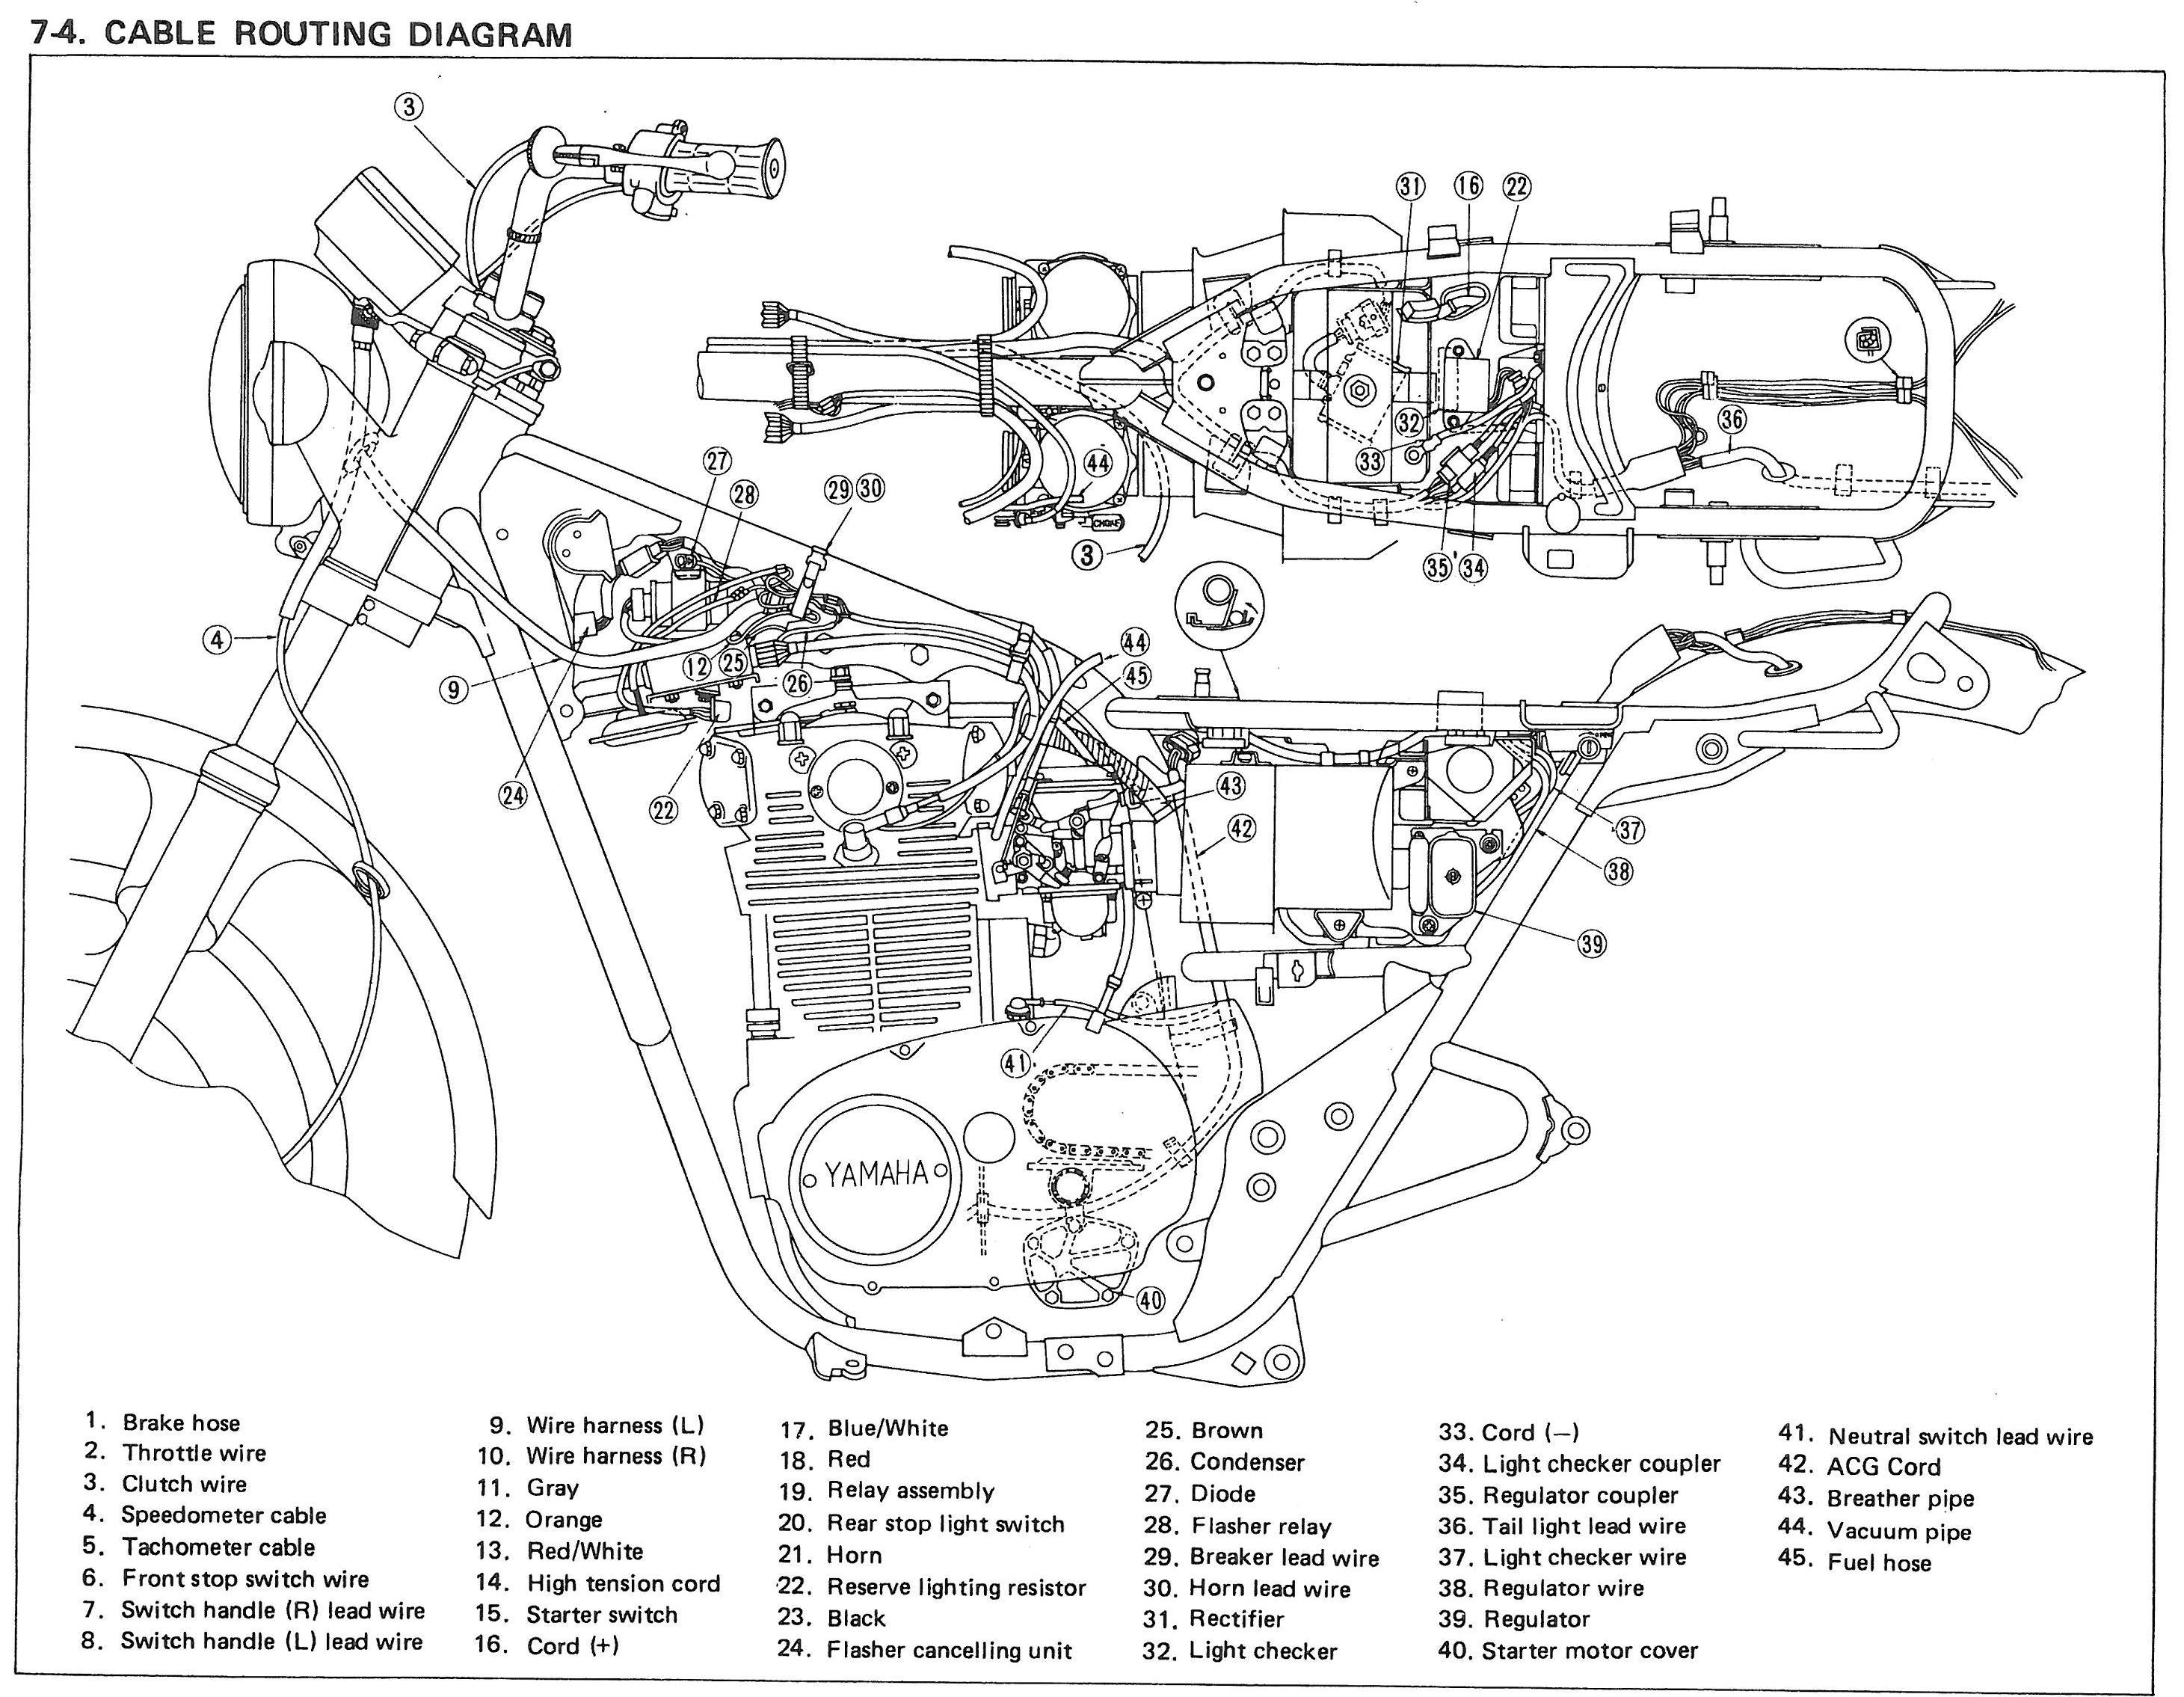 xs650 carb diagram schematics wiring diagrams u2022 rh seniorlivinguniversity co Yamaha XS650 Carbs XS650 Carb Needle Jet Locations